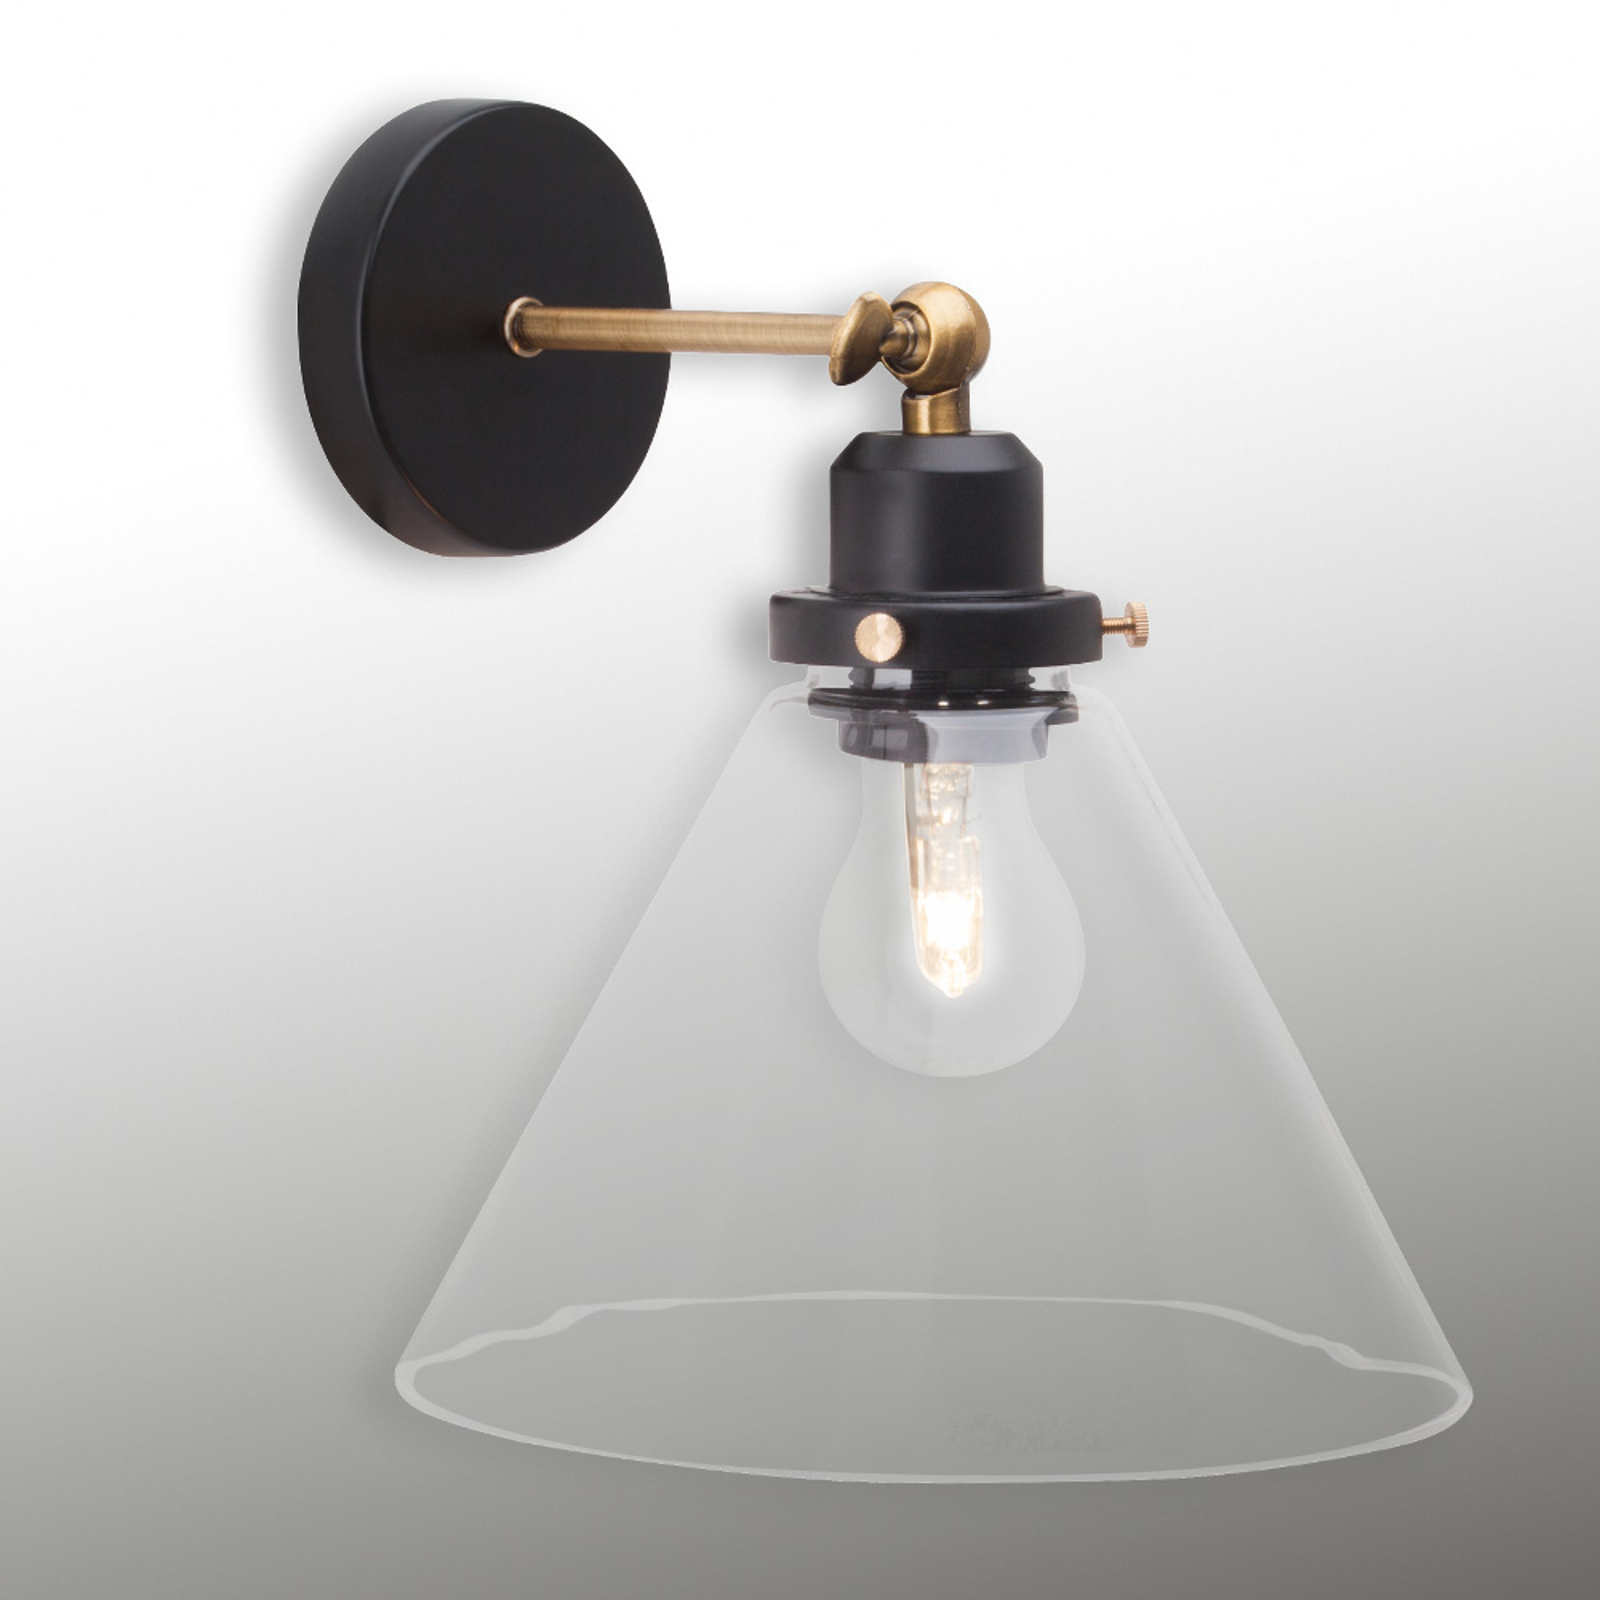 Antik væglampe Ronald